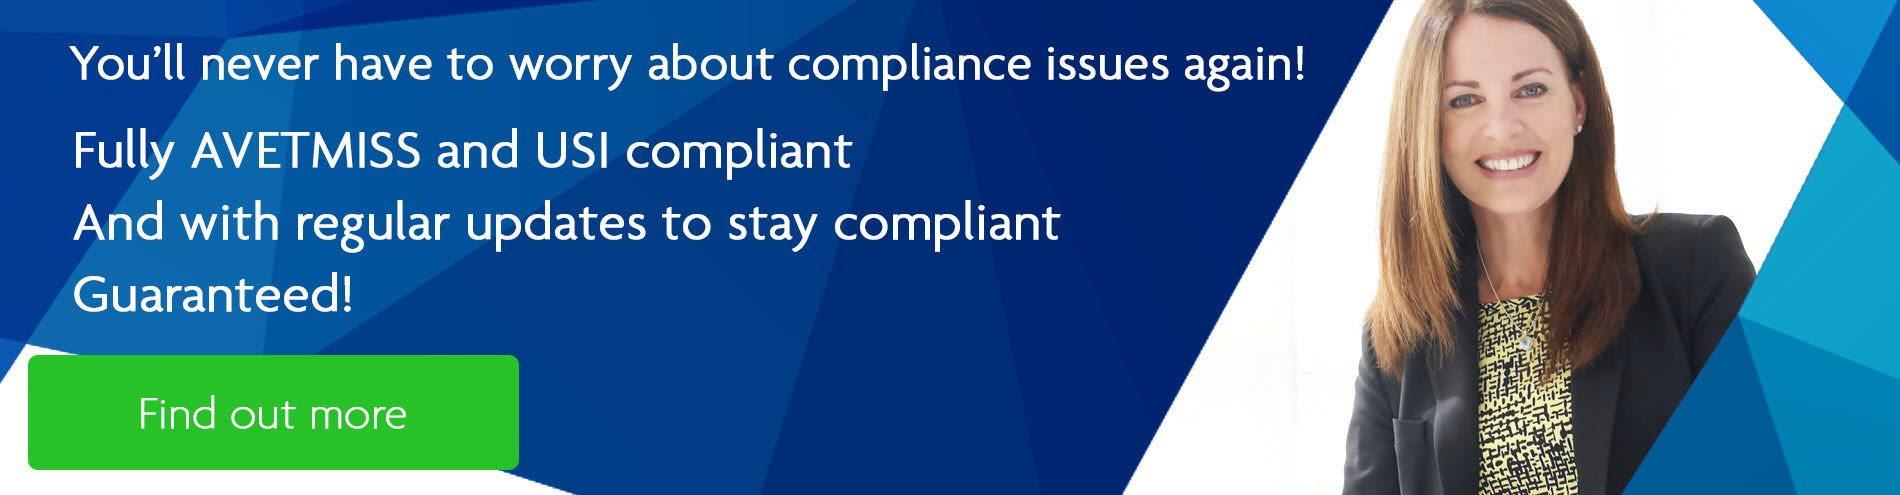 AvetmissUsiCompliance